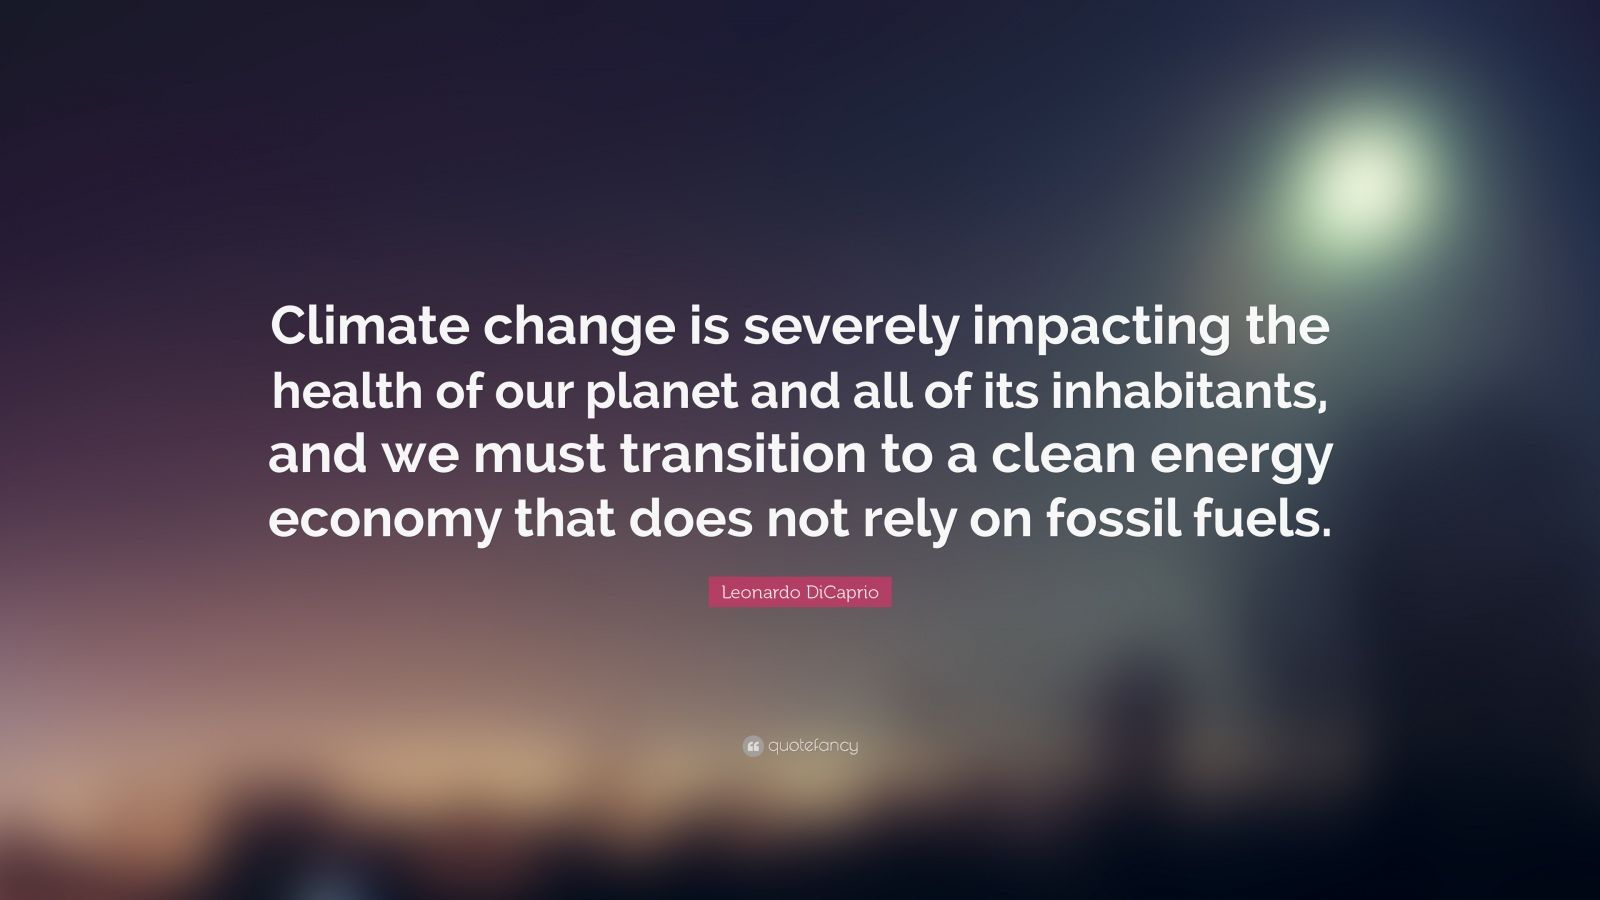 leonardo dicaprio quote climate change is severely